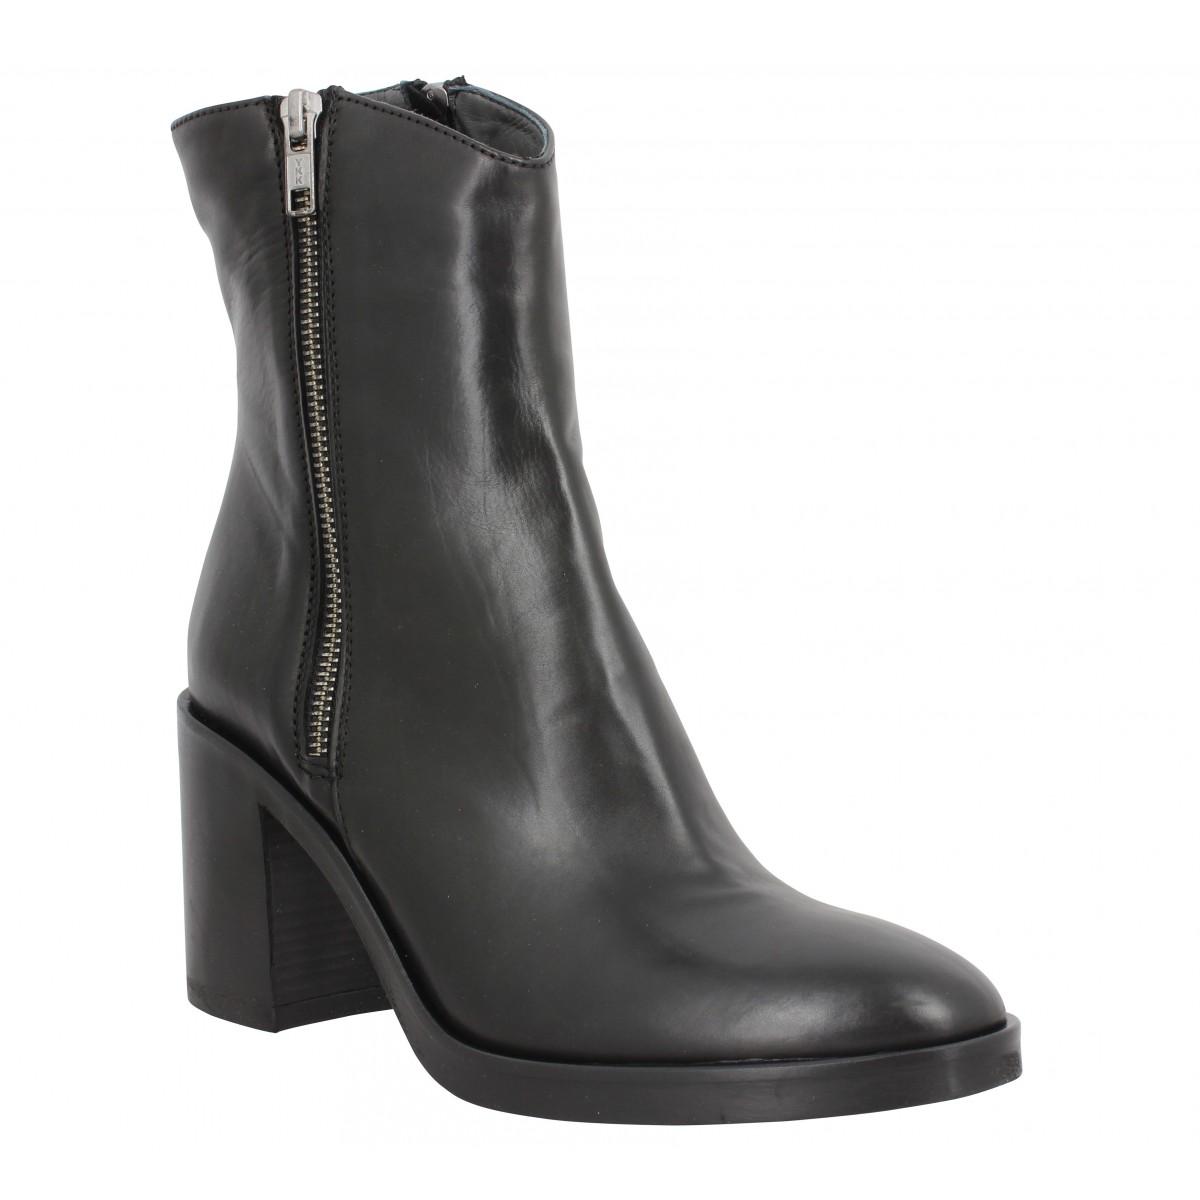 Bottines FRU.IT 6710 cuir Femme Noir